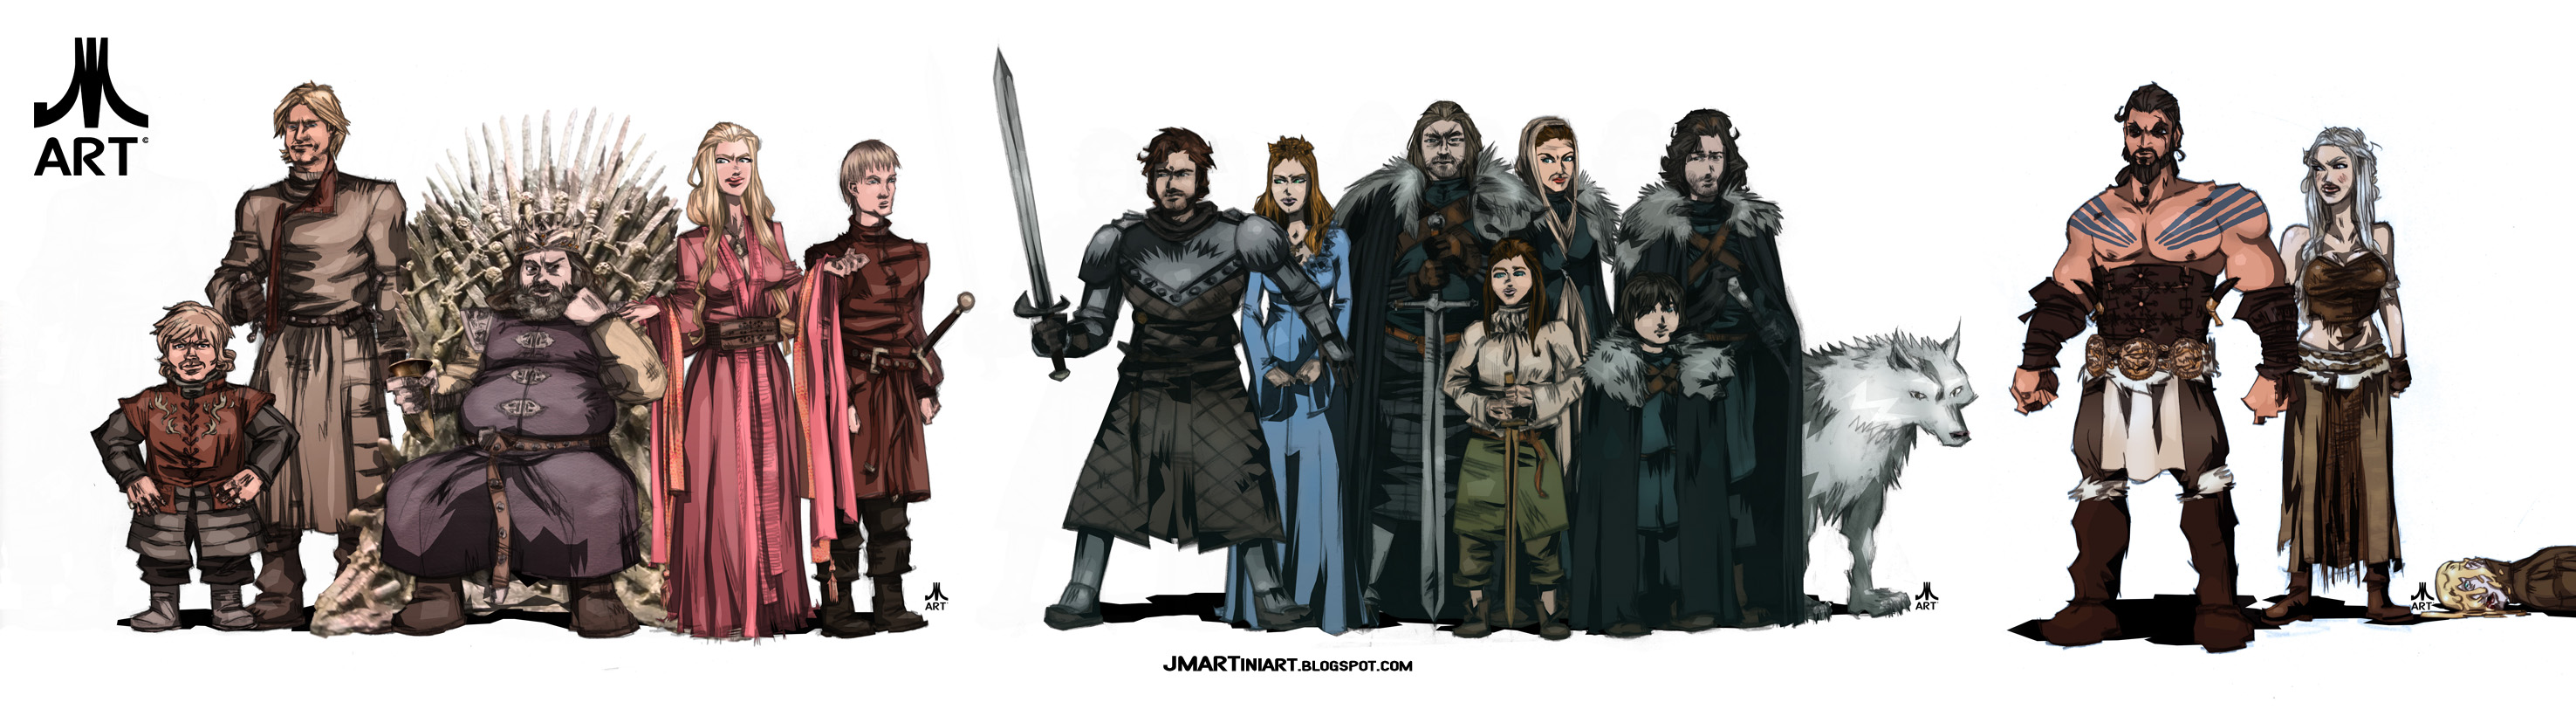 Game of Thrones SEASON ONE CAST